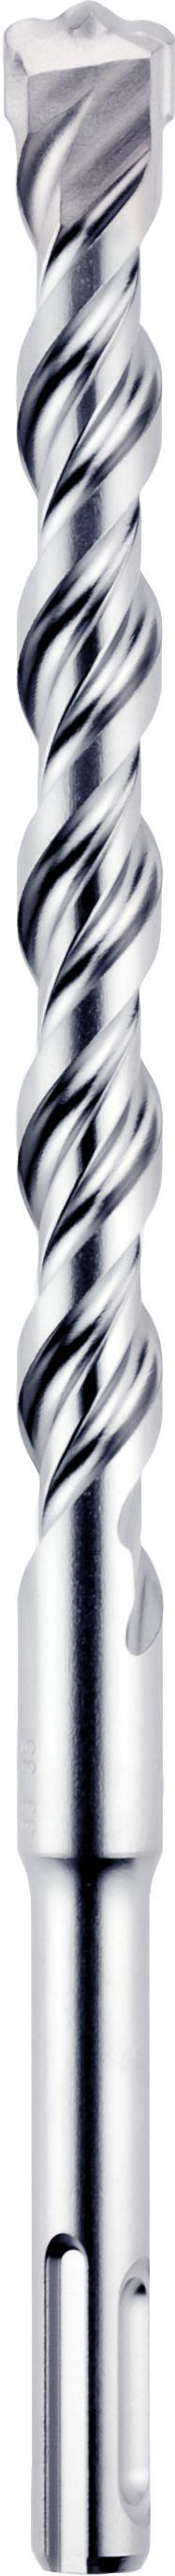 Slika BORER Rocket 3 SDS-plus 6,5x210 mm